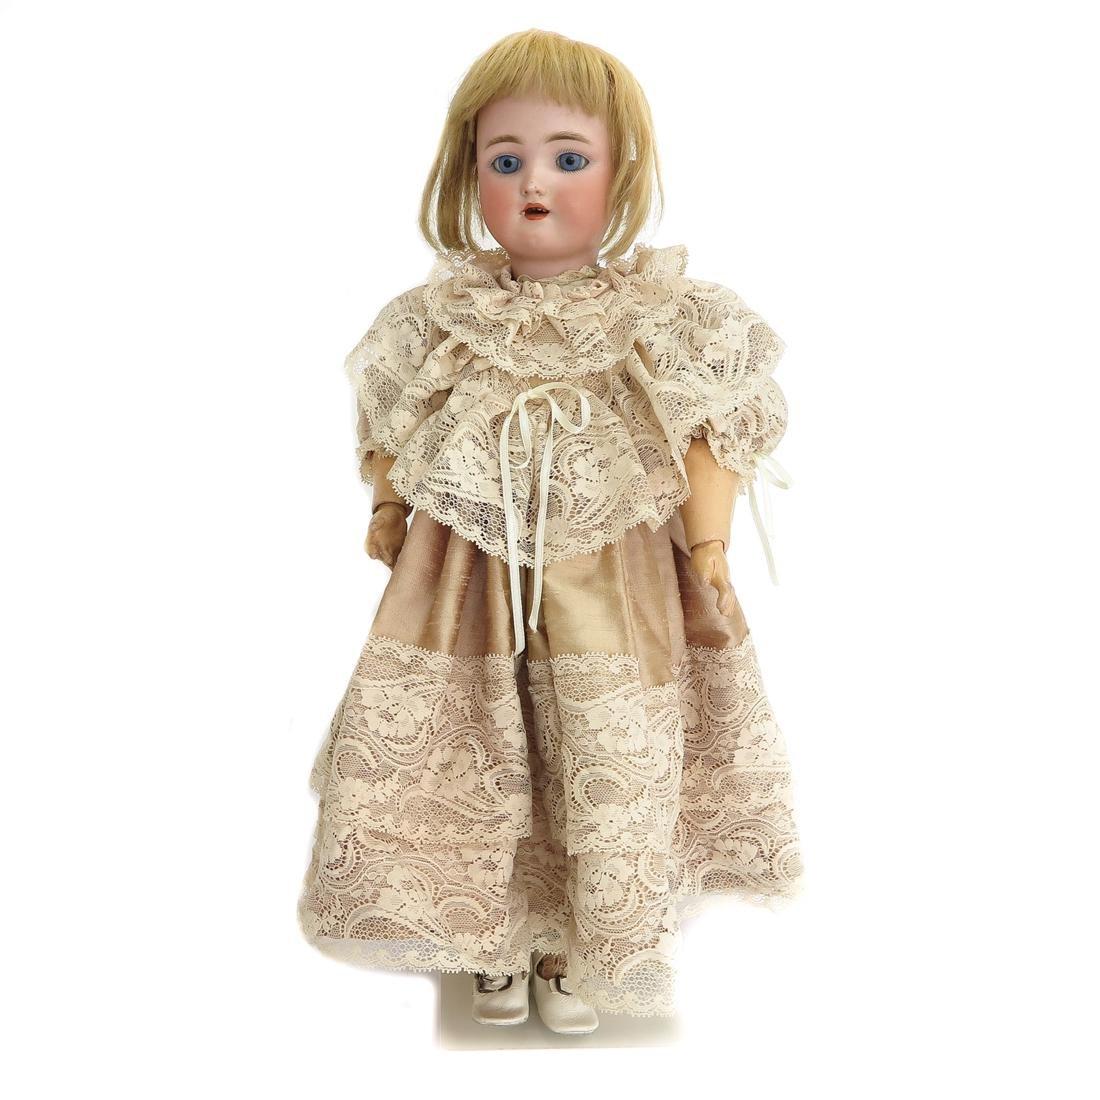 Henrich Handwerck / Simon Halbig Antique Doll